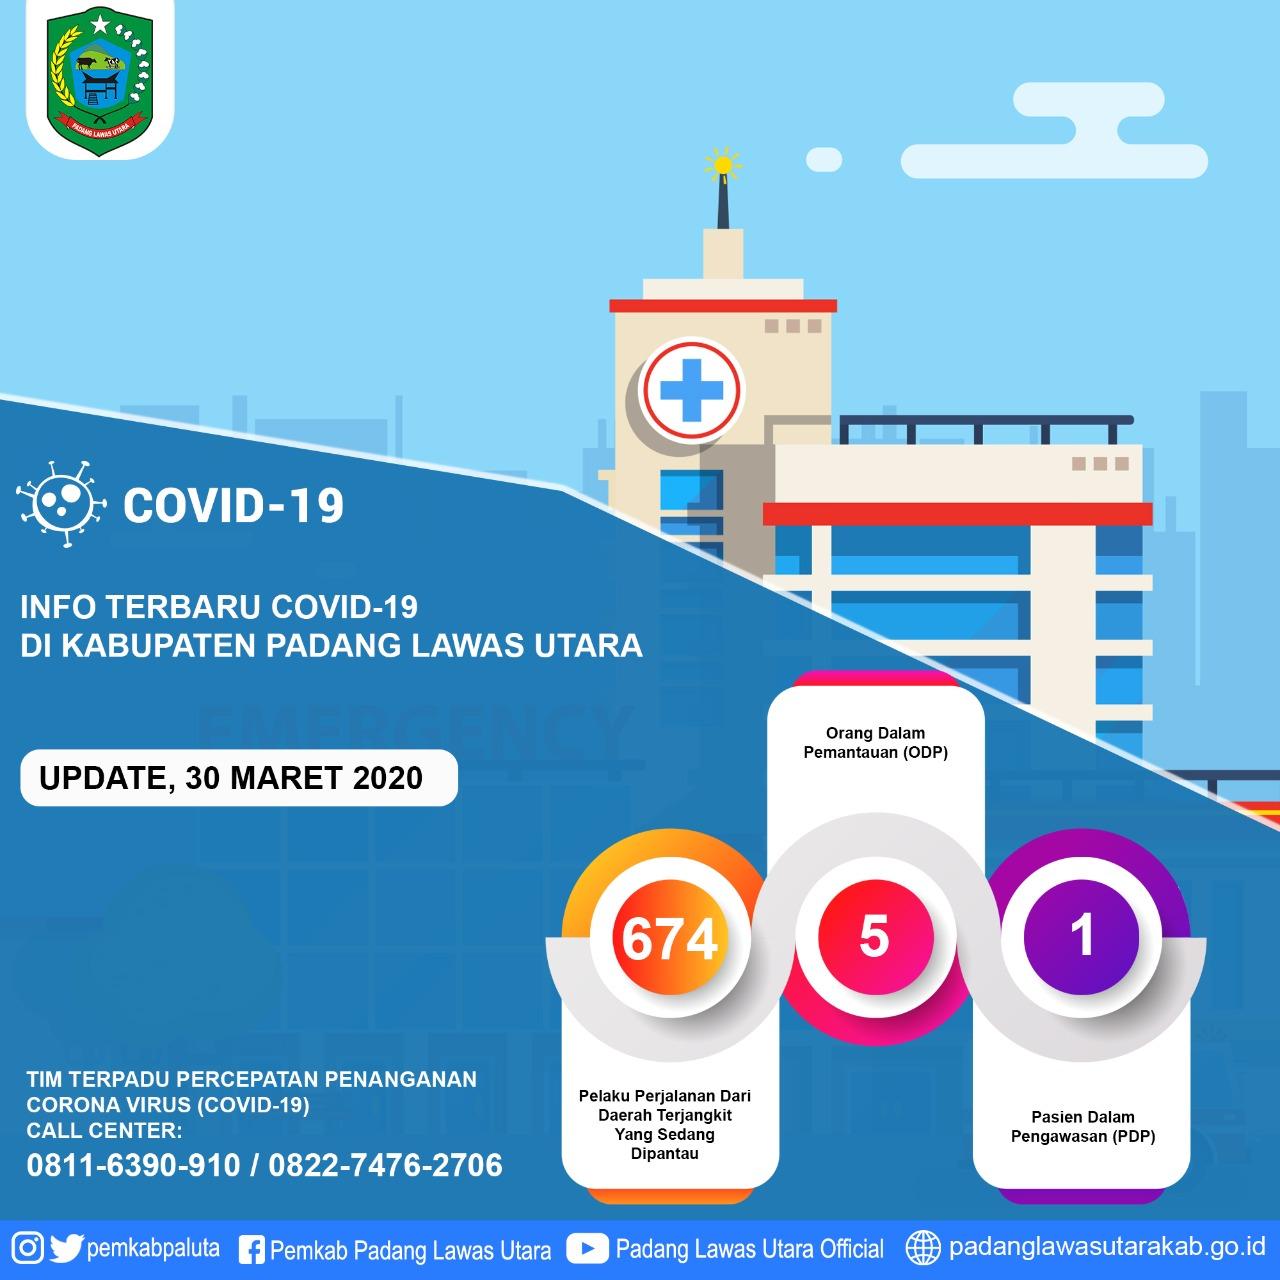 Di Paluta 1 Orang Pdp Positif Corona Belum Ada Suluh Sumatera